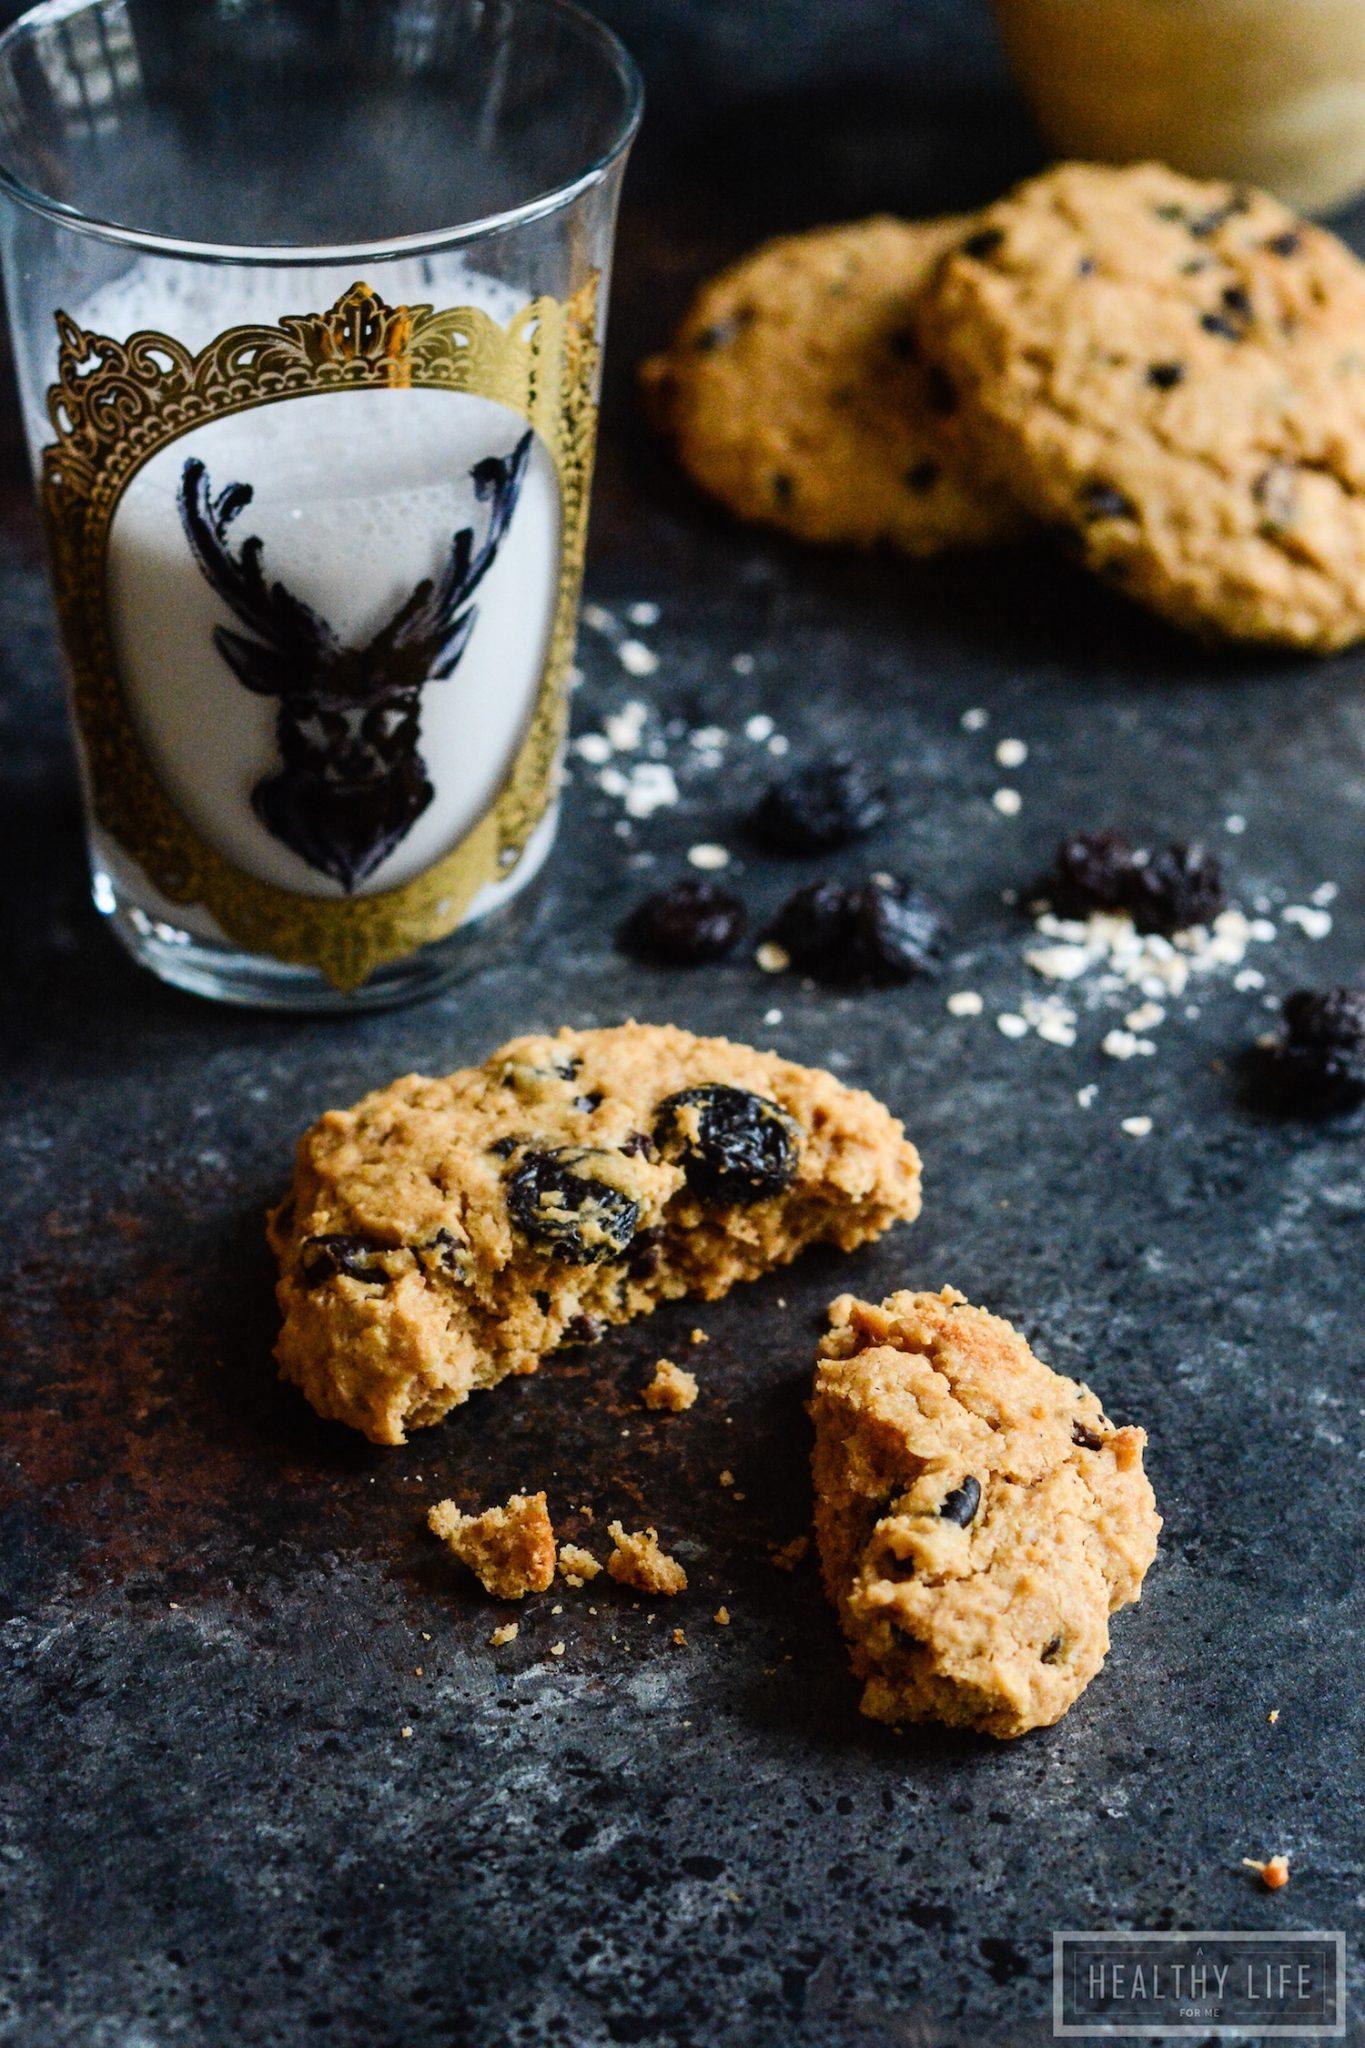 Superfood Peanut Butter Protein Breakfast Cookies